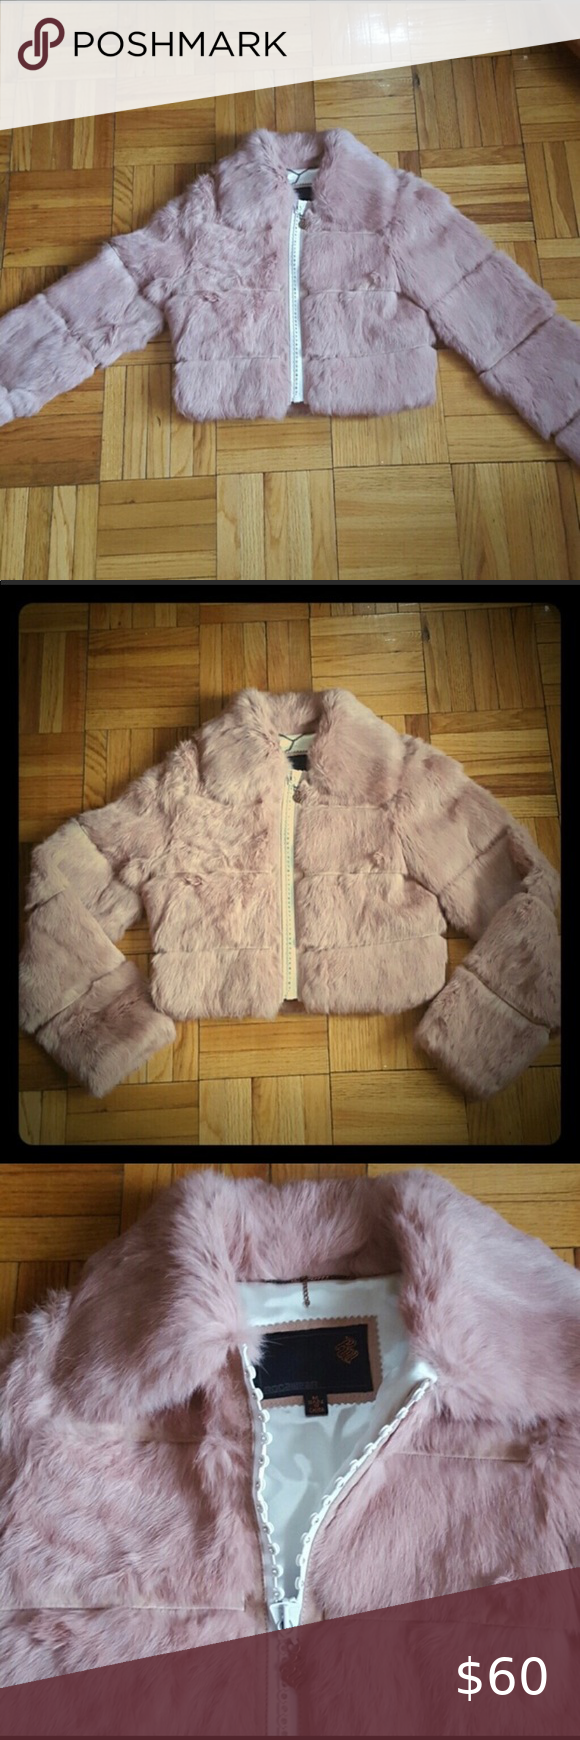 Beautiful Rocawear Rabbit Fur Coat Stunning Clothes Design Rocawear Fashion Design [ 1740 x 580 Pixel ]